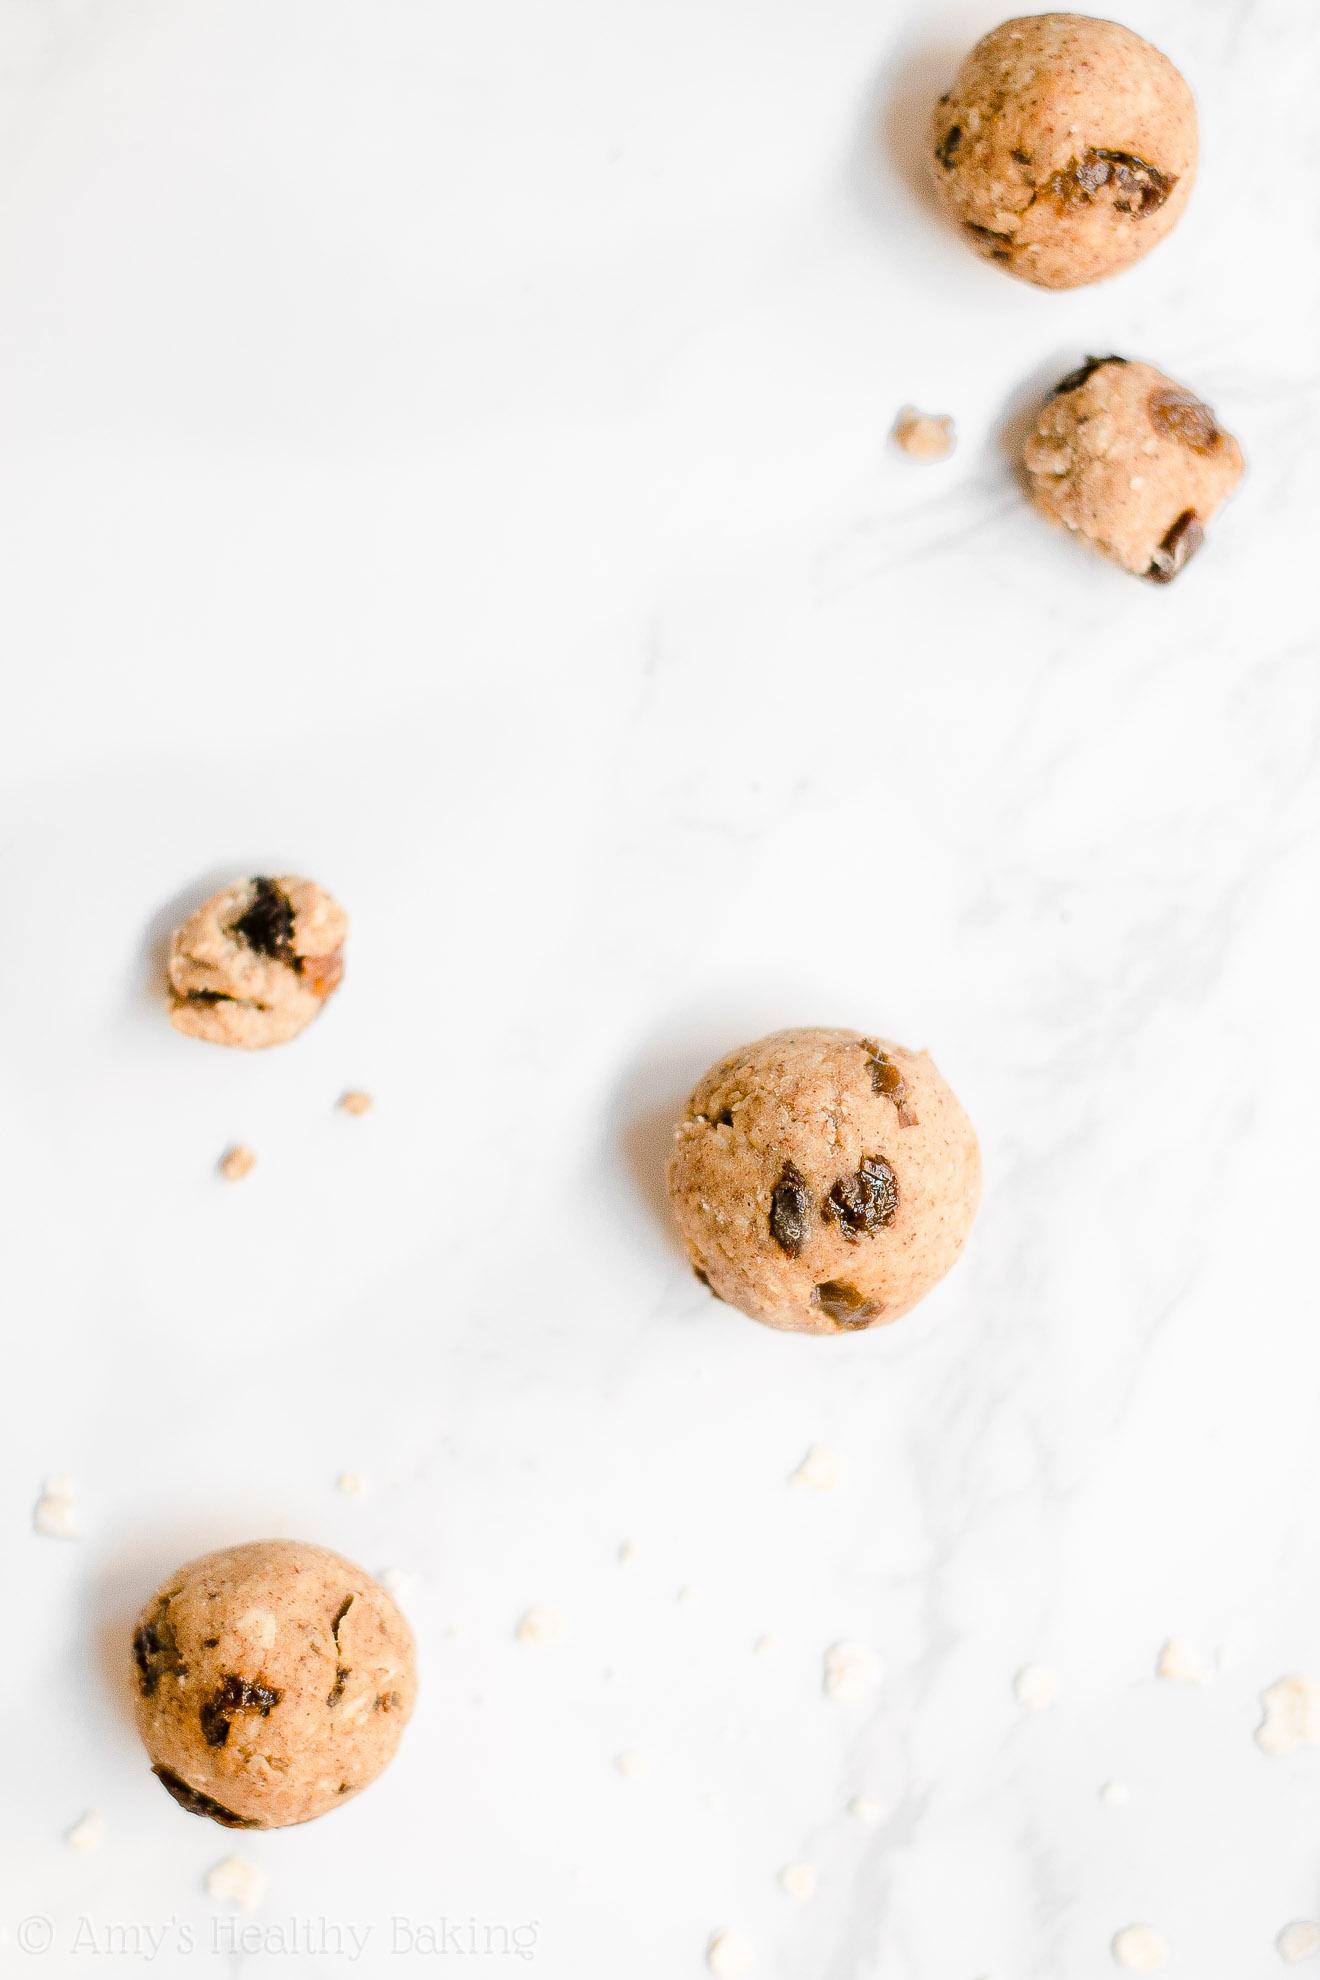 Healthy Edible Low Fat Flourless Oatmeal Raisin Cookie Dough Bites